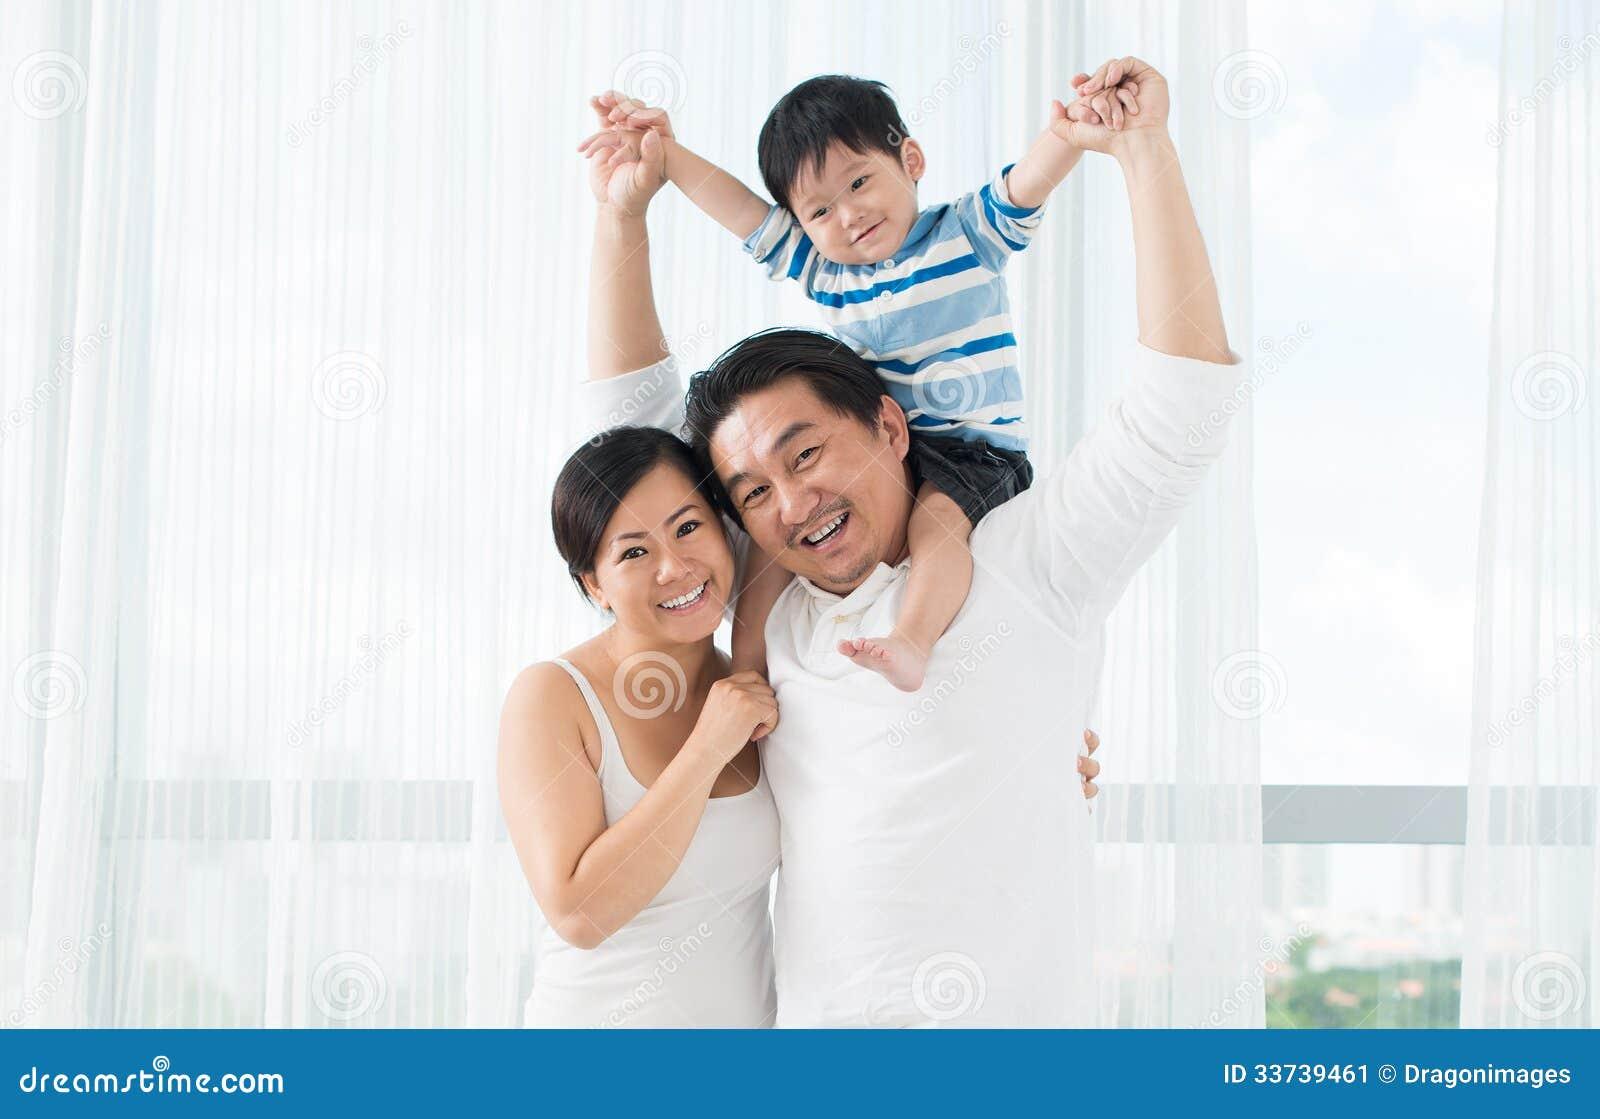 Смешная семья